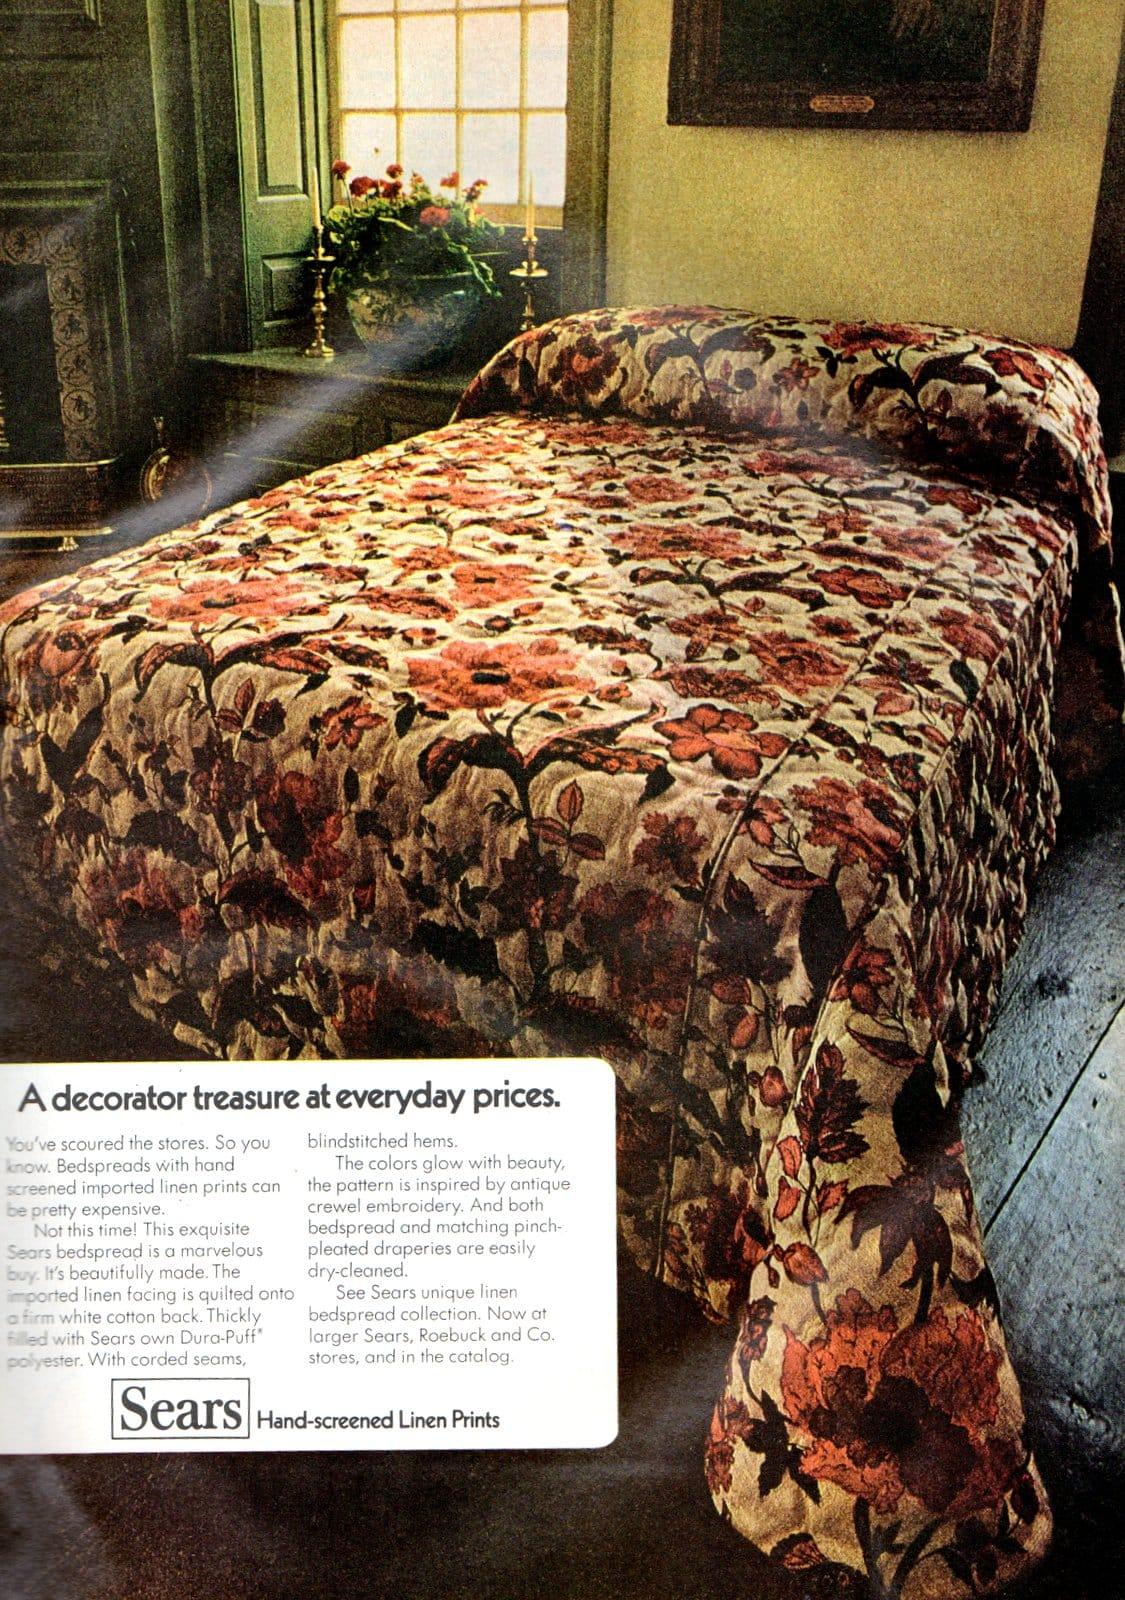 Vintage 1970s bedspreads - Hand-screened linen prints (1971)